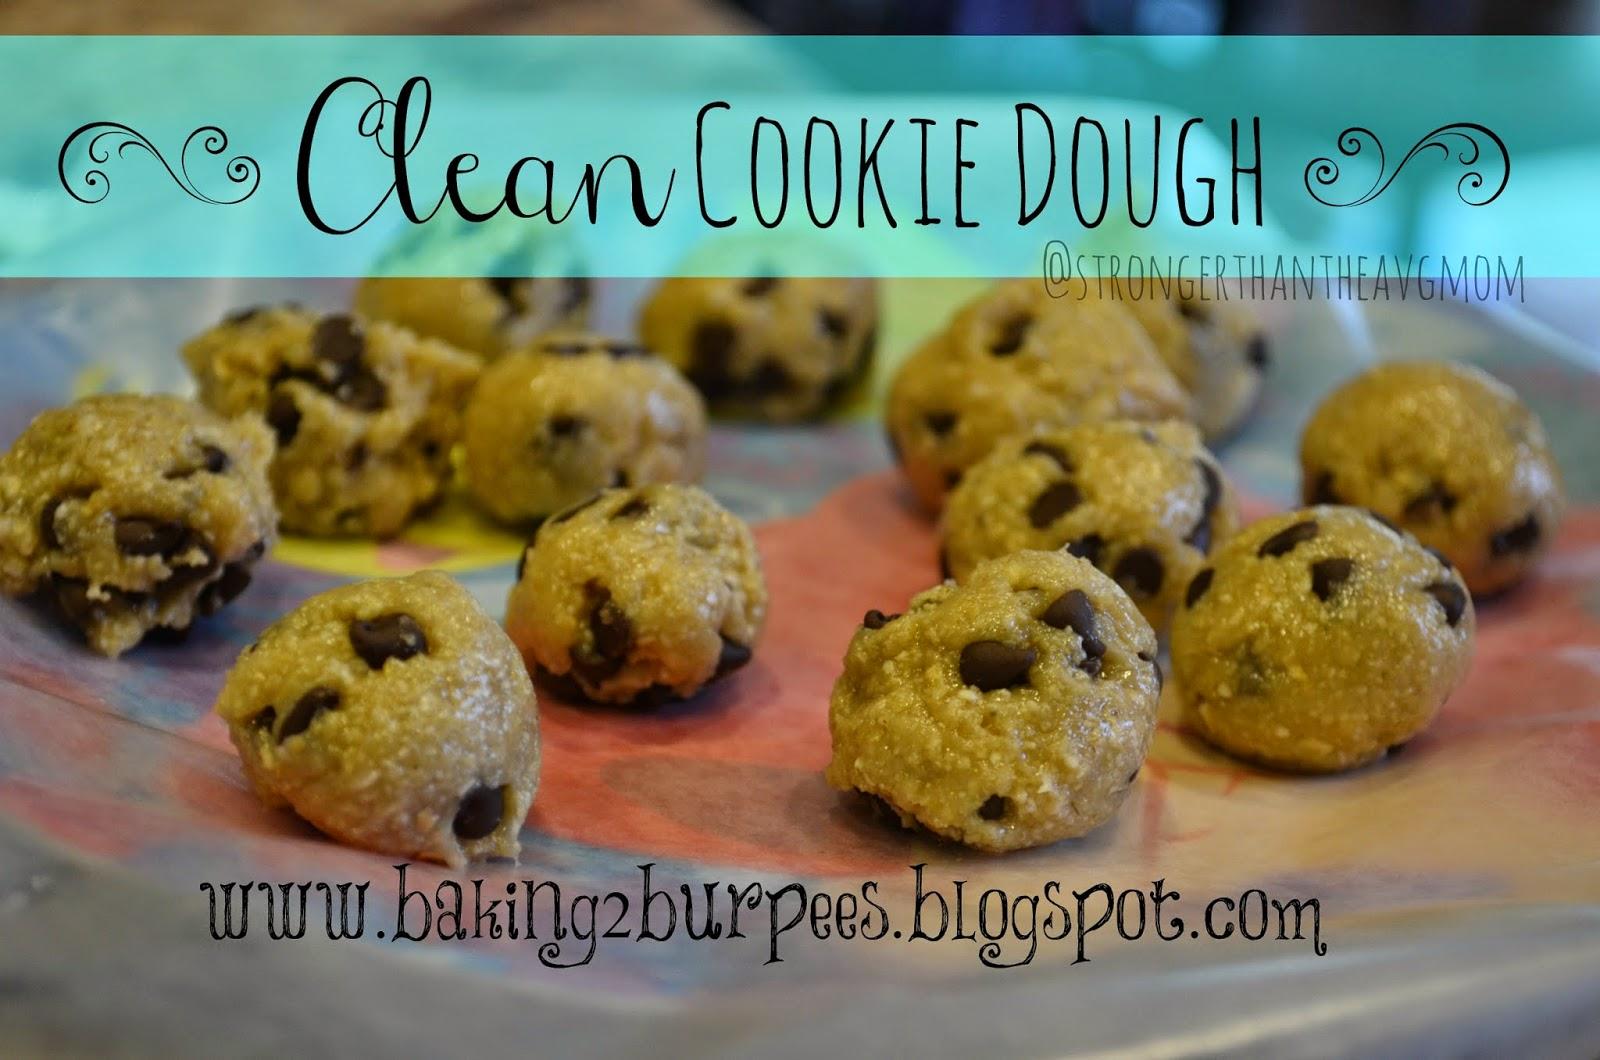 Clean eating recipe, kid approved recipe, healthy swap, cookie dough recipe, Pittsburgh, fit mom, nurse, cravings, Erin Traill, diamond beachbody coach